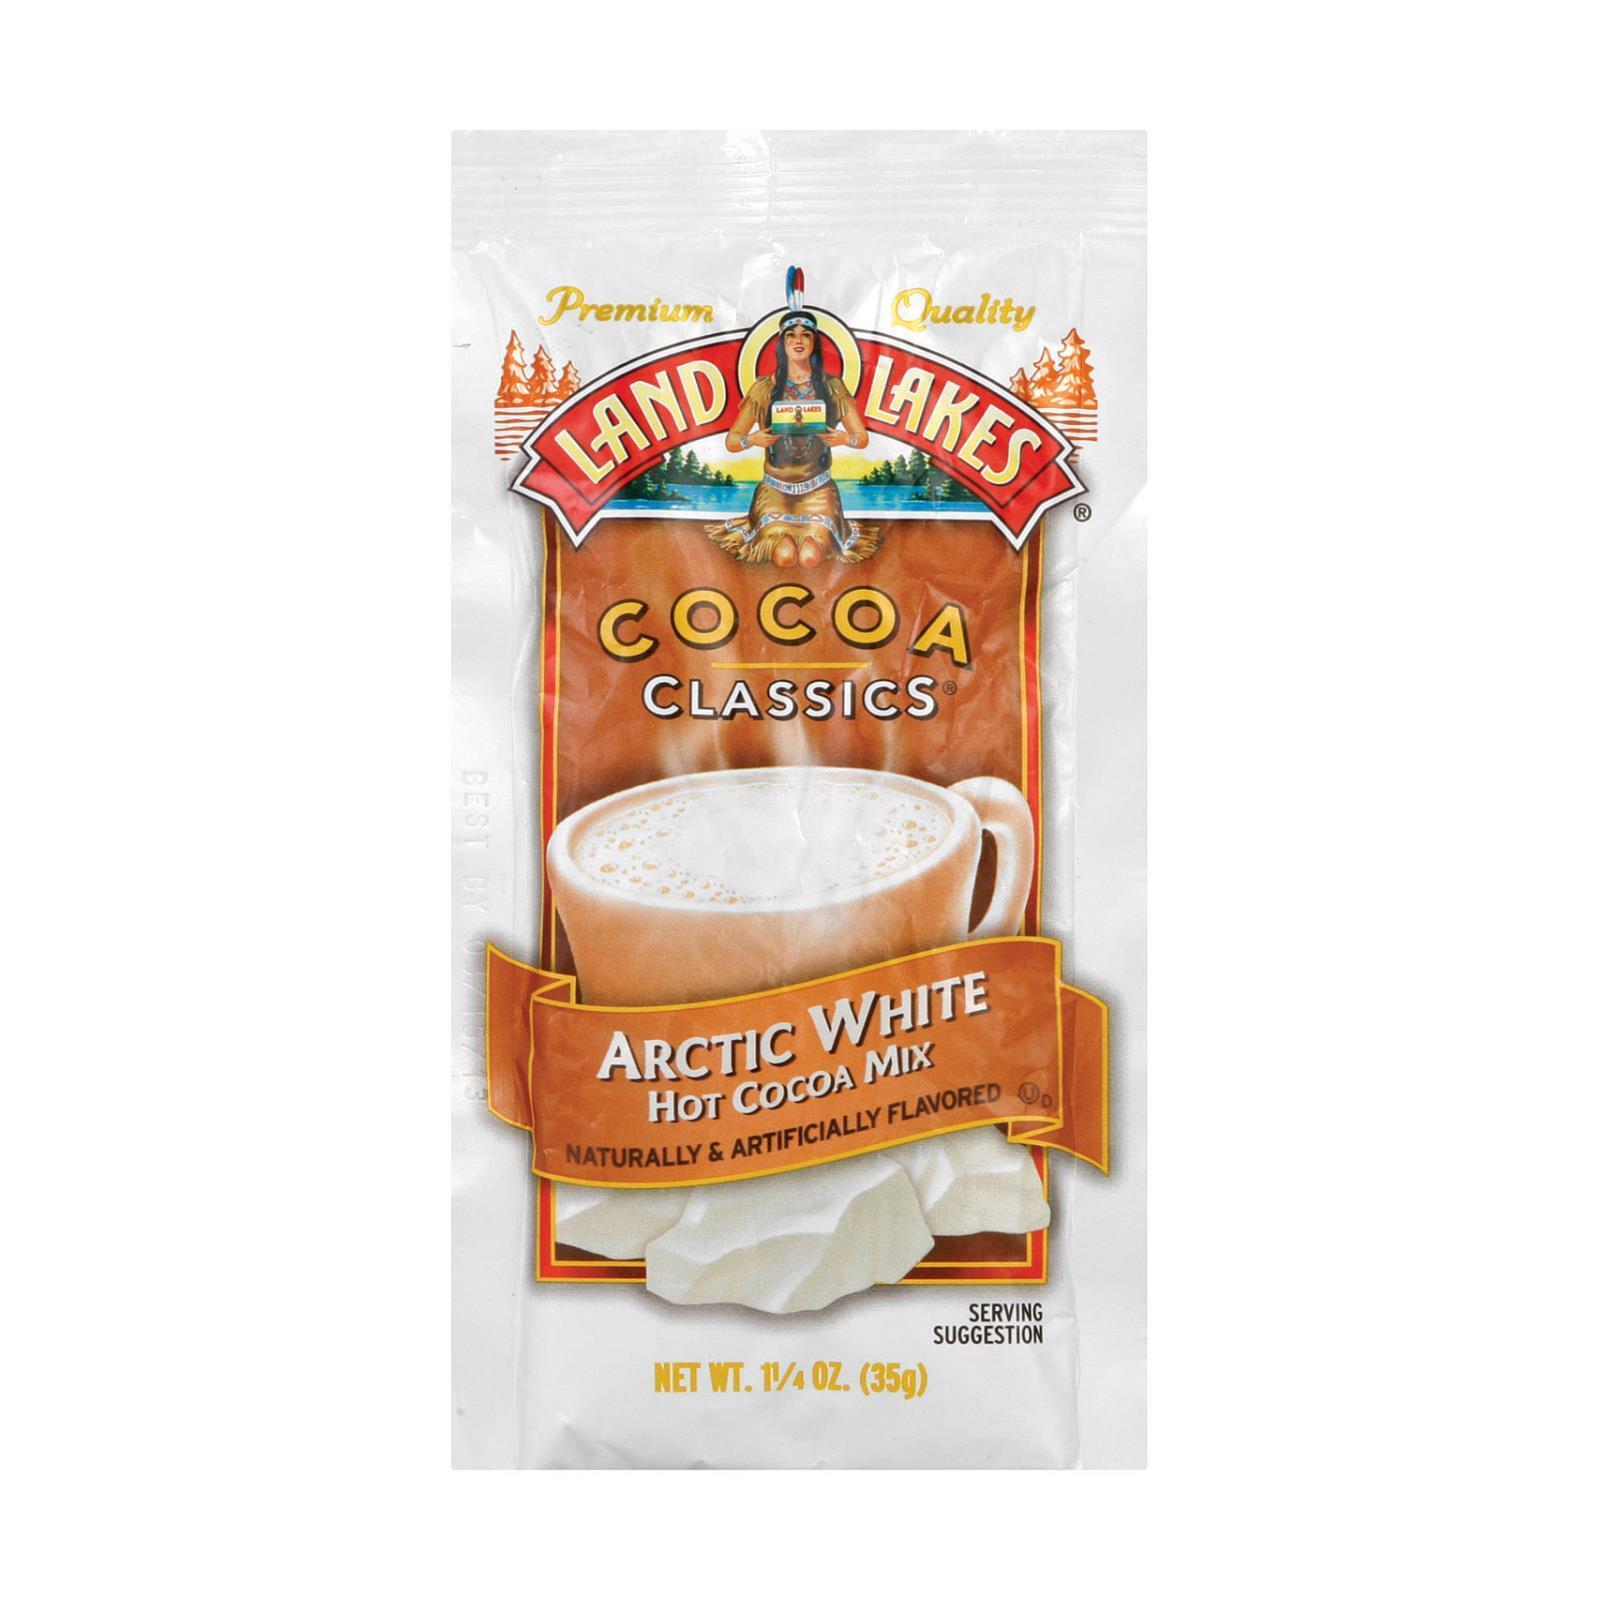 Land O Lakes Cocoa Classics - Artic White - Case of 12 - 1.25 oz.